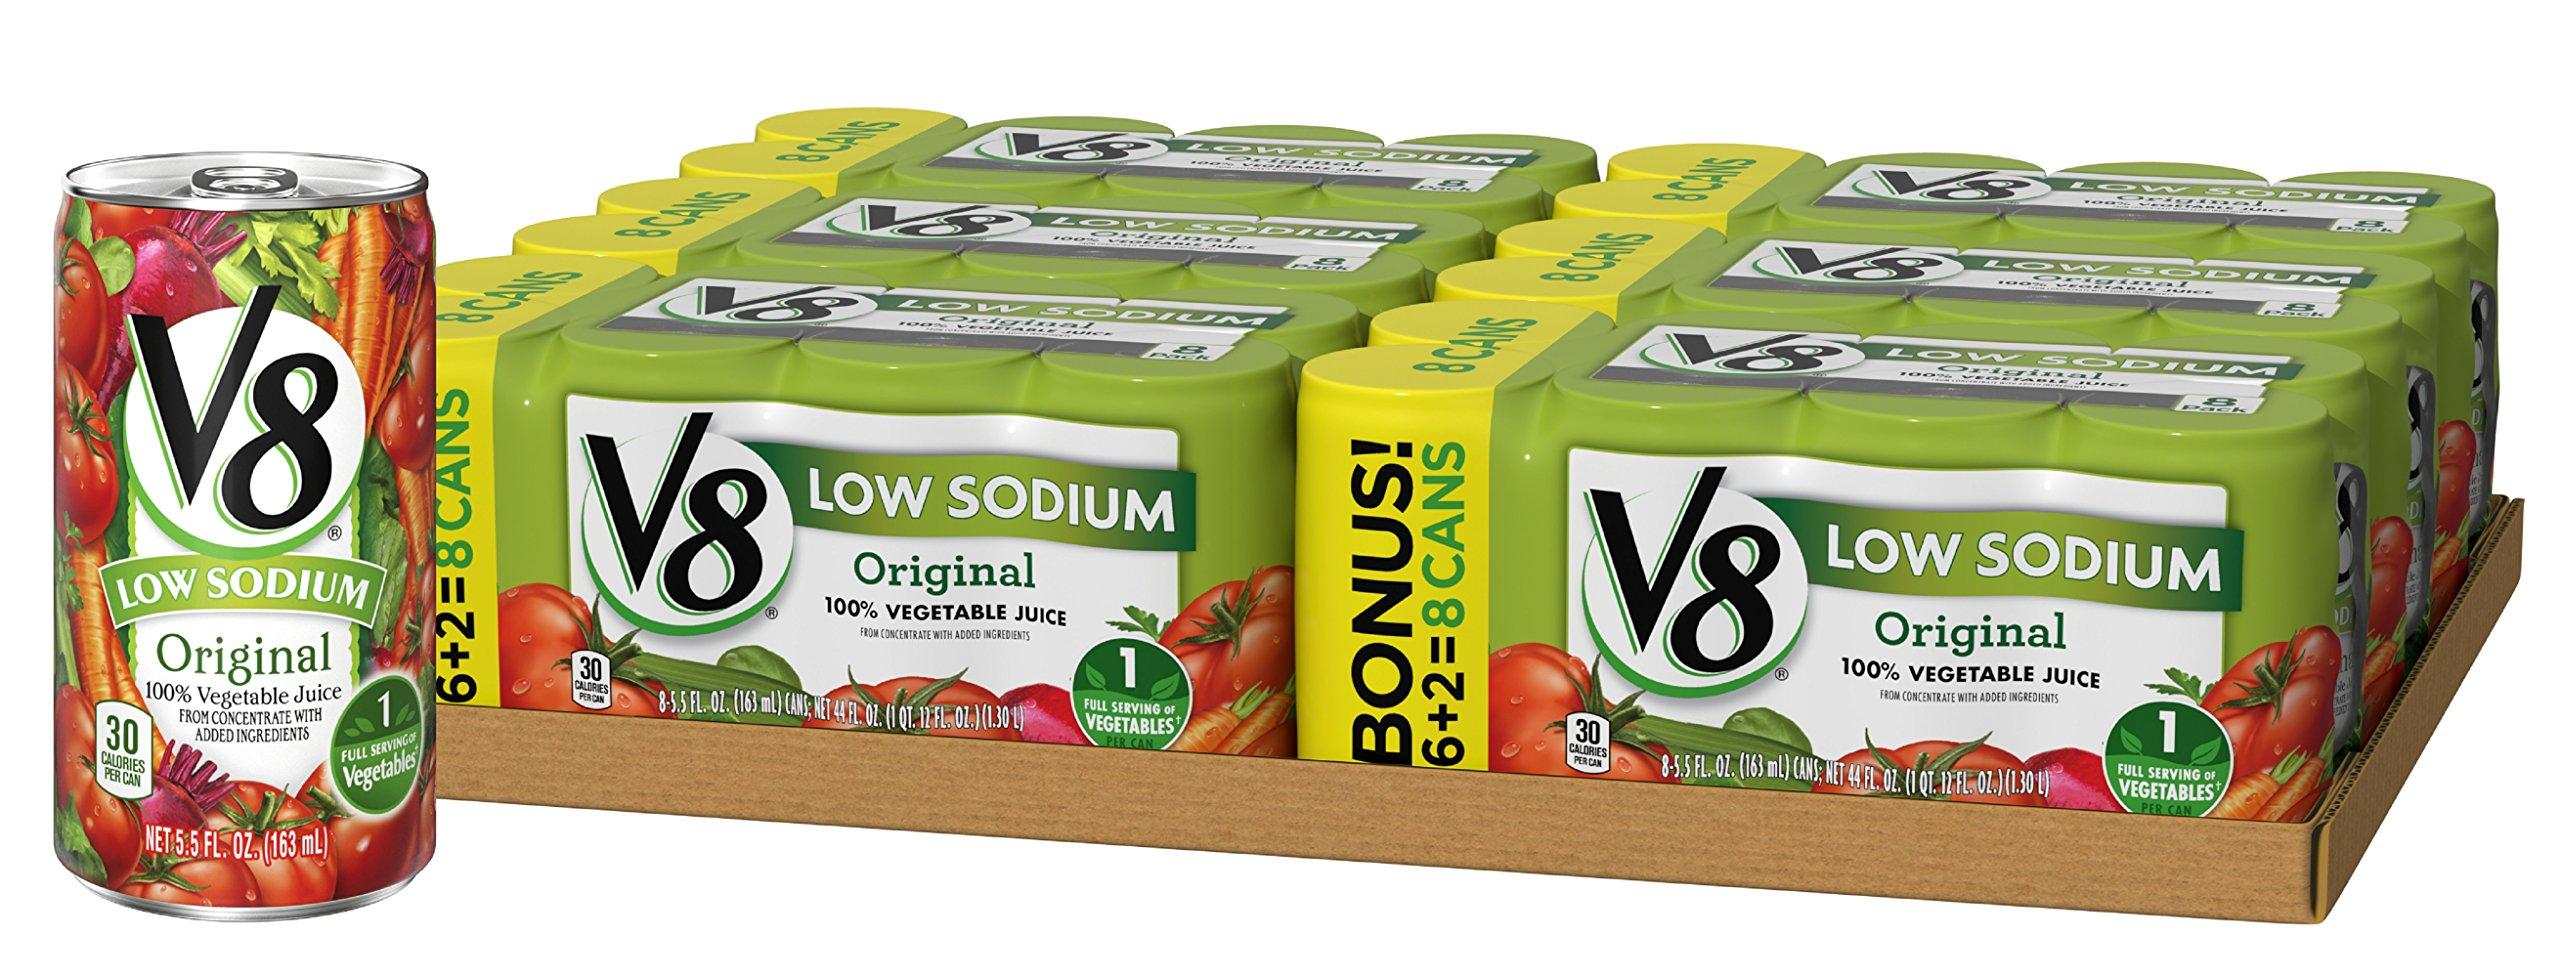 V8 Original Low Sodium 100% Vegetable Juice, 5.5 Fl Oz Can (6 packs of 8, Total of 48)